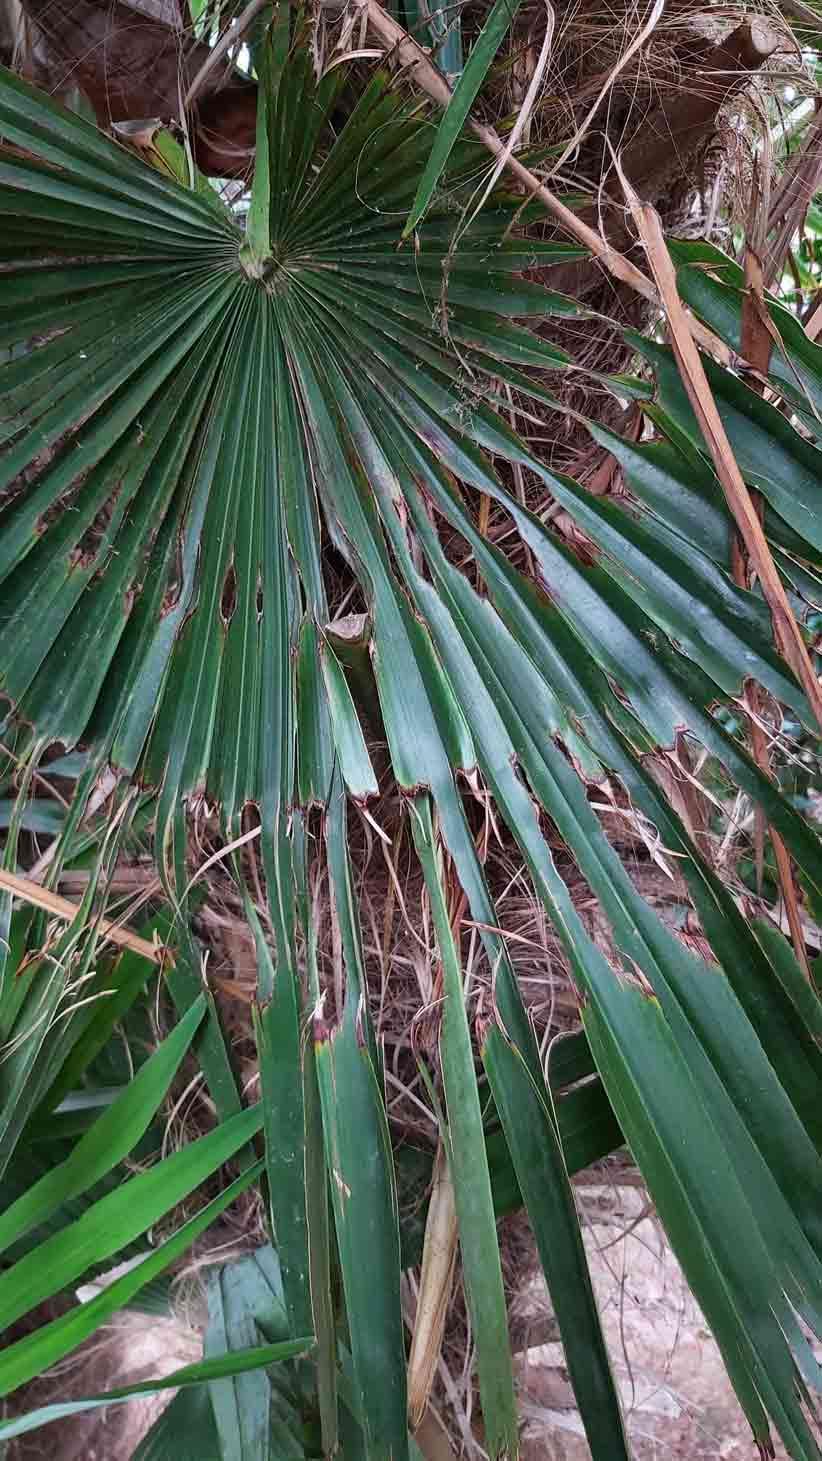 Symptoms-trachicarpus-palms-bud-attack-6